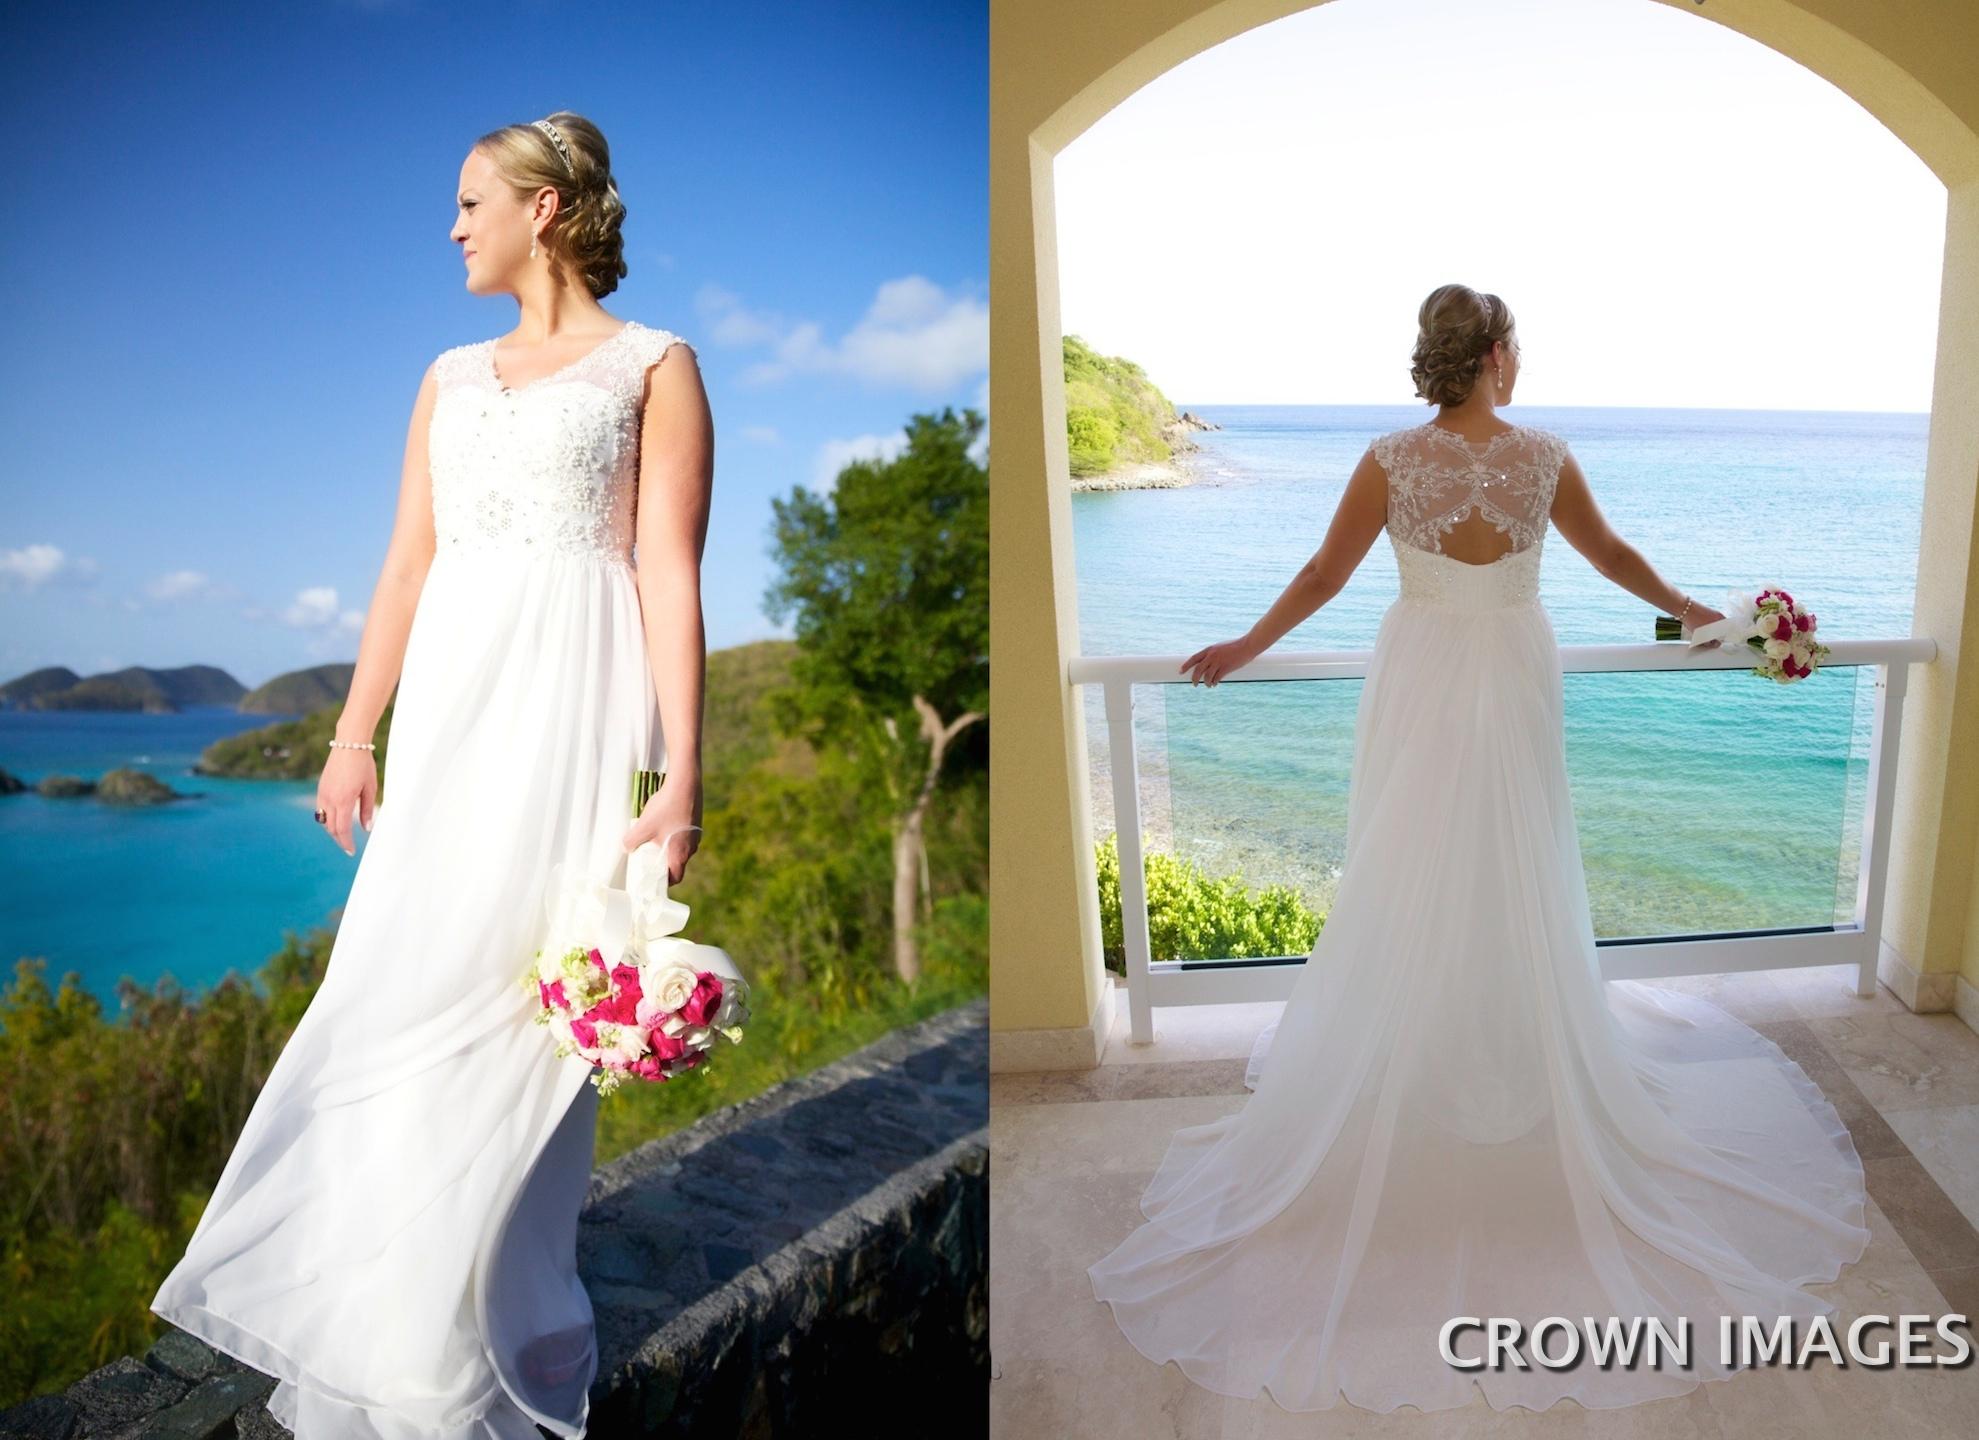 pre bridal wedding photos st john crown images